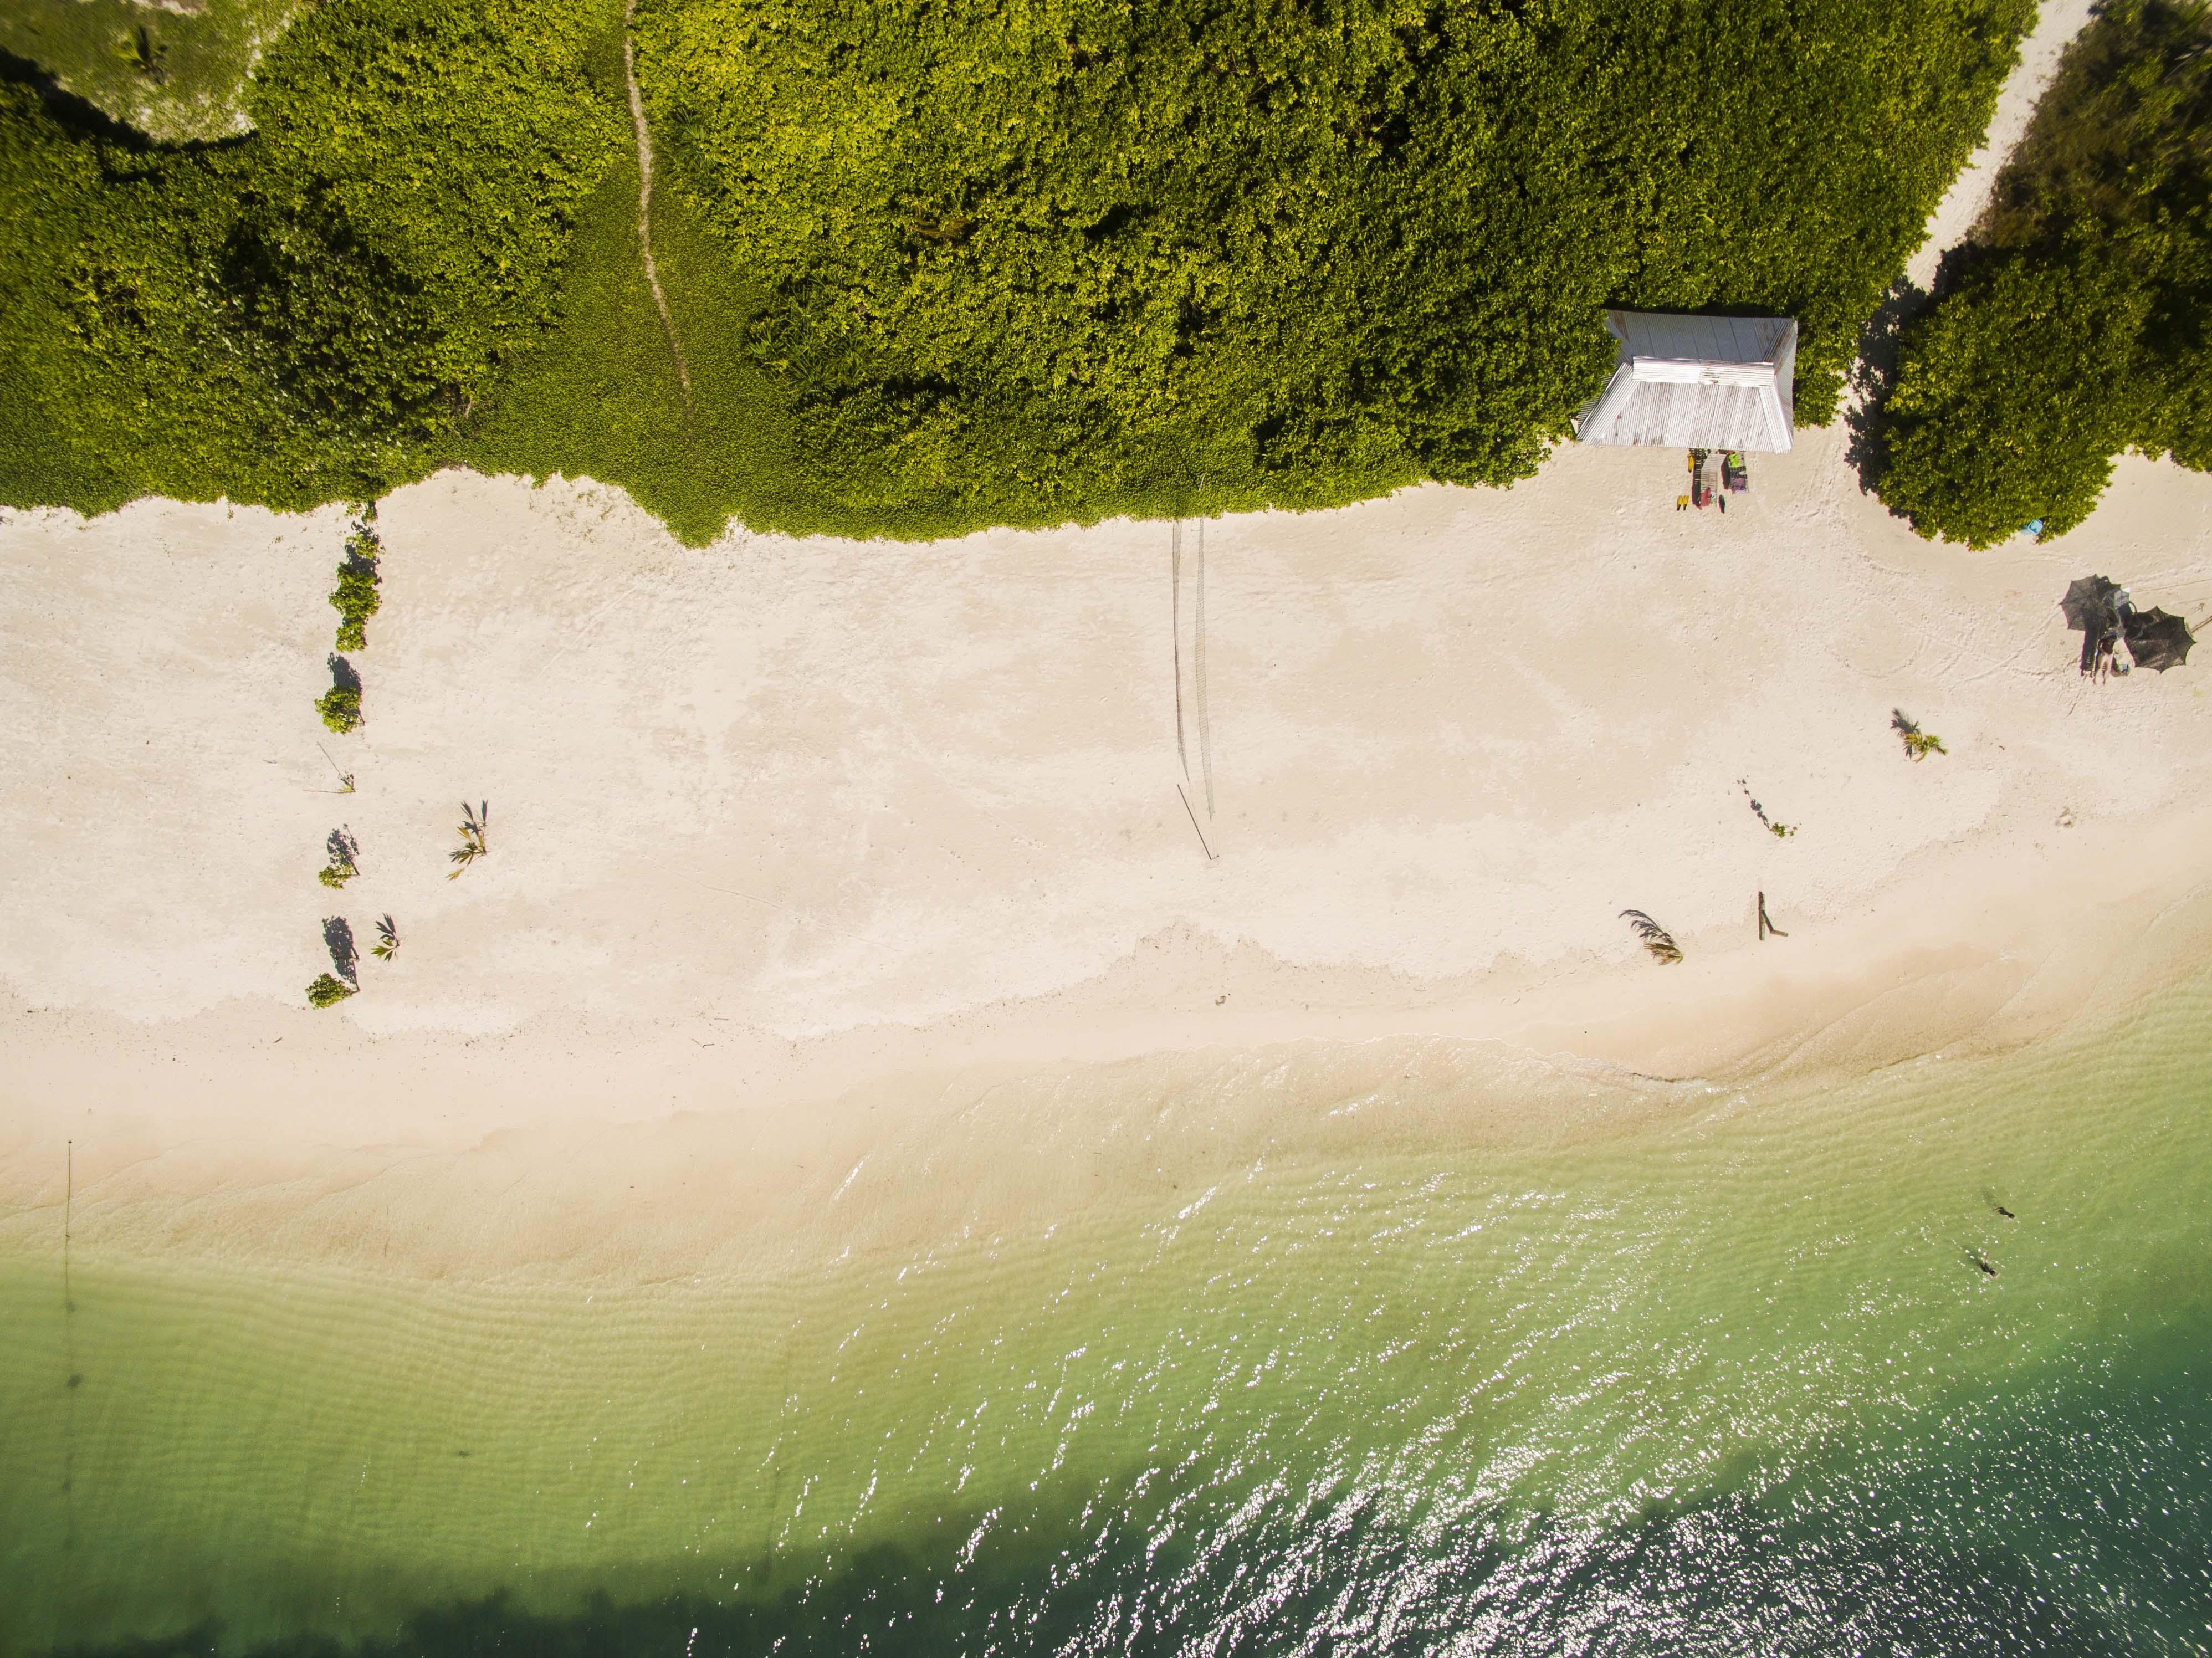 Lacabana Maldives  A Dh Maamigili Island (14)